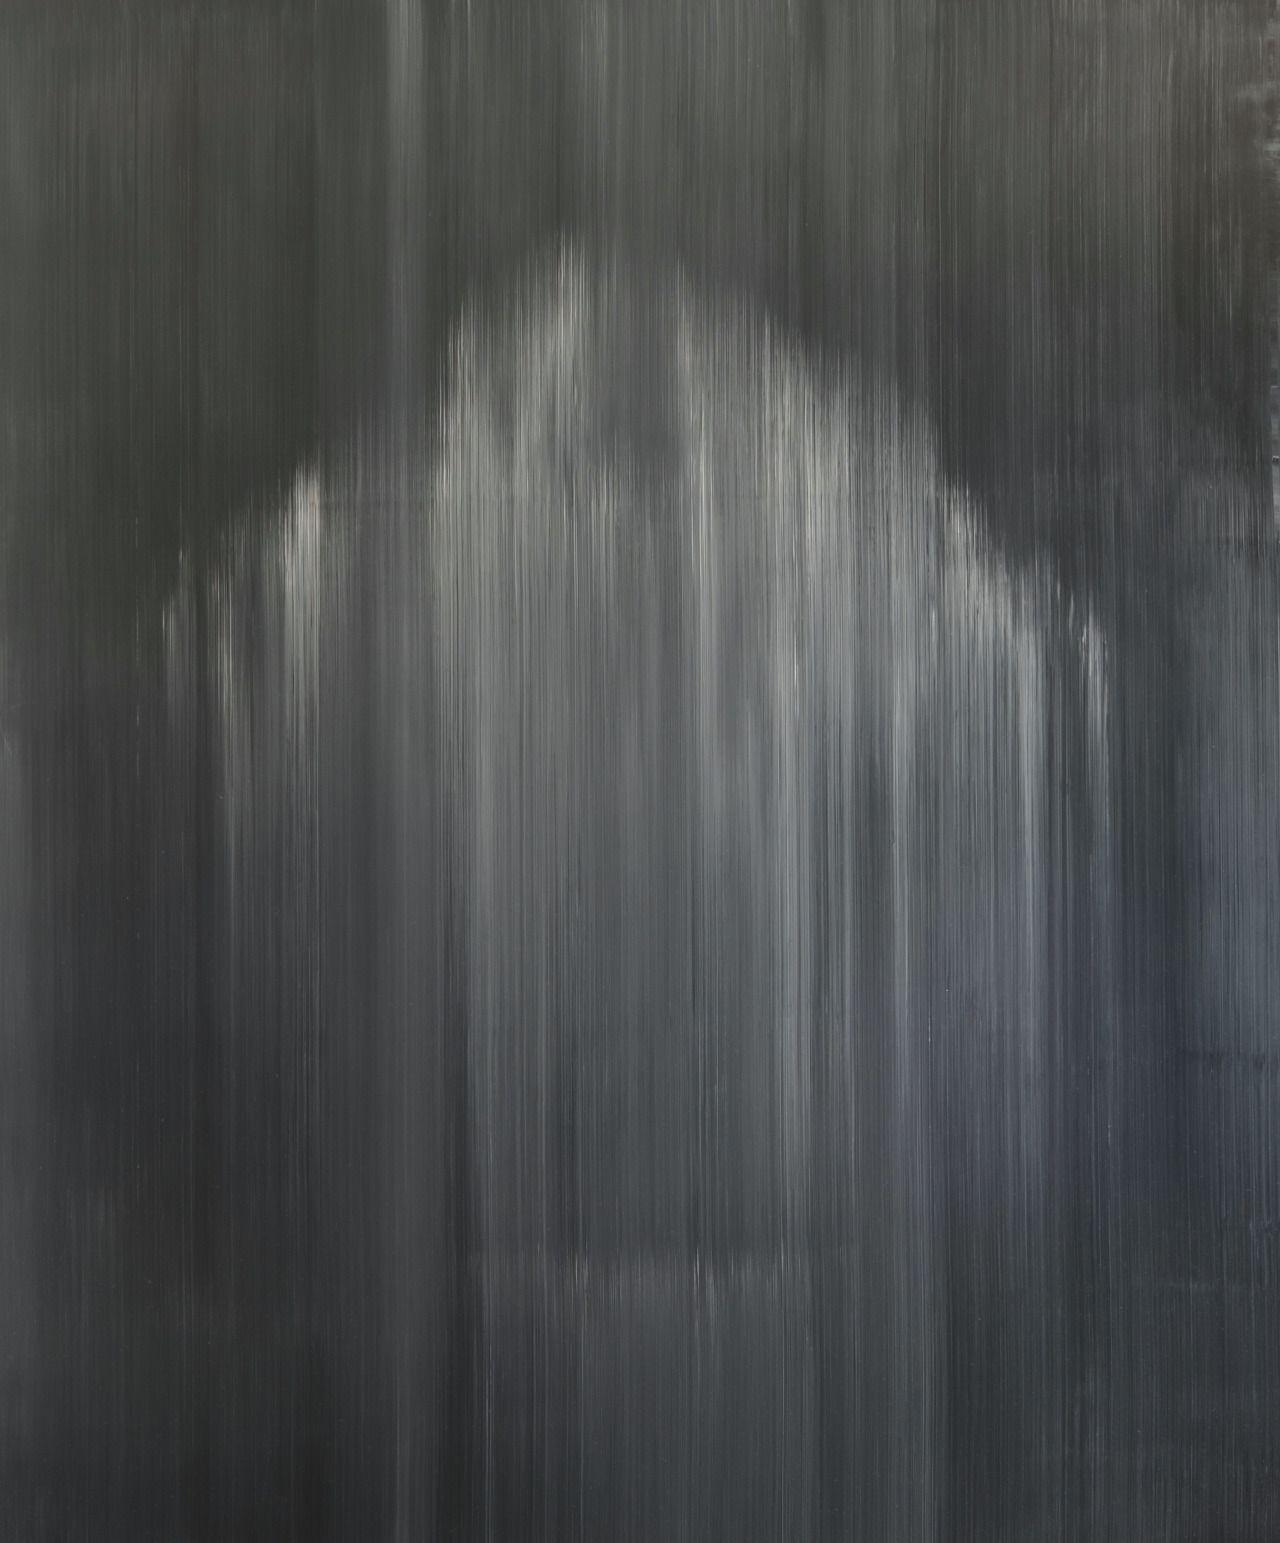 Akihito Takuma, Lines of Flight, op.423, oil on canvas, 2013 http://gakeigimlet.org/2014/01/takuma2014/